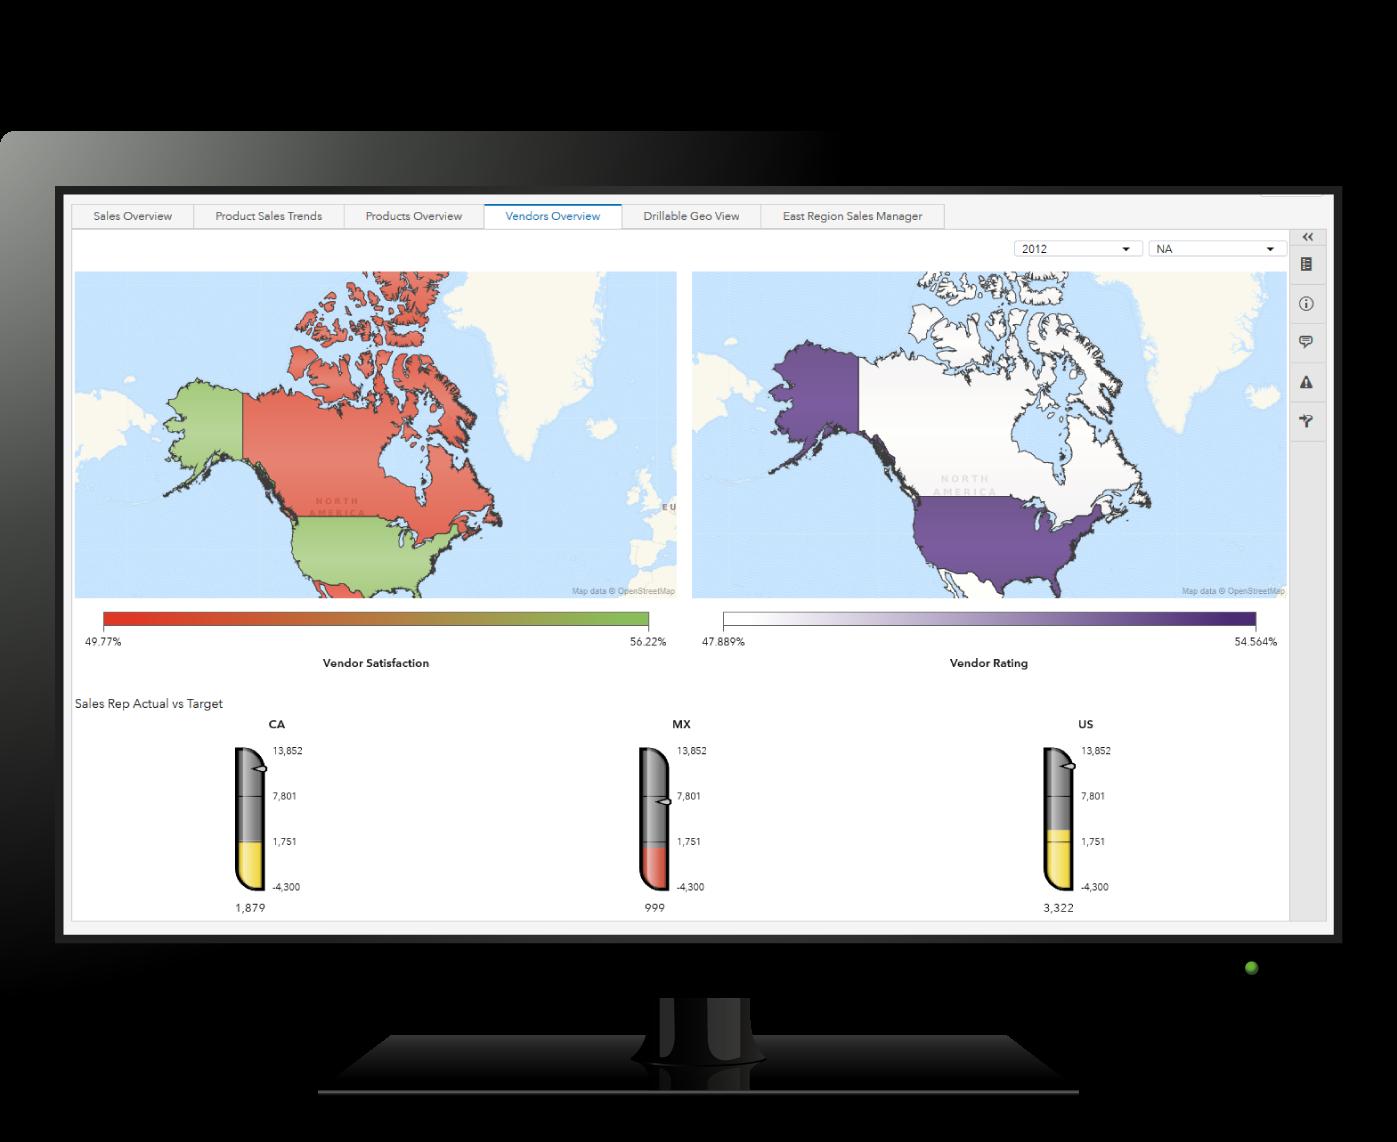 Computer showing SAS Analytics